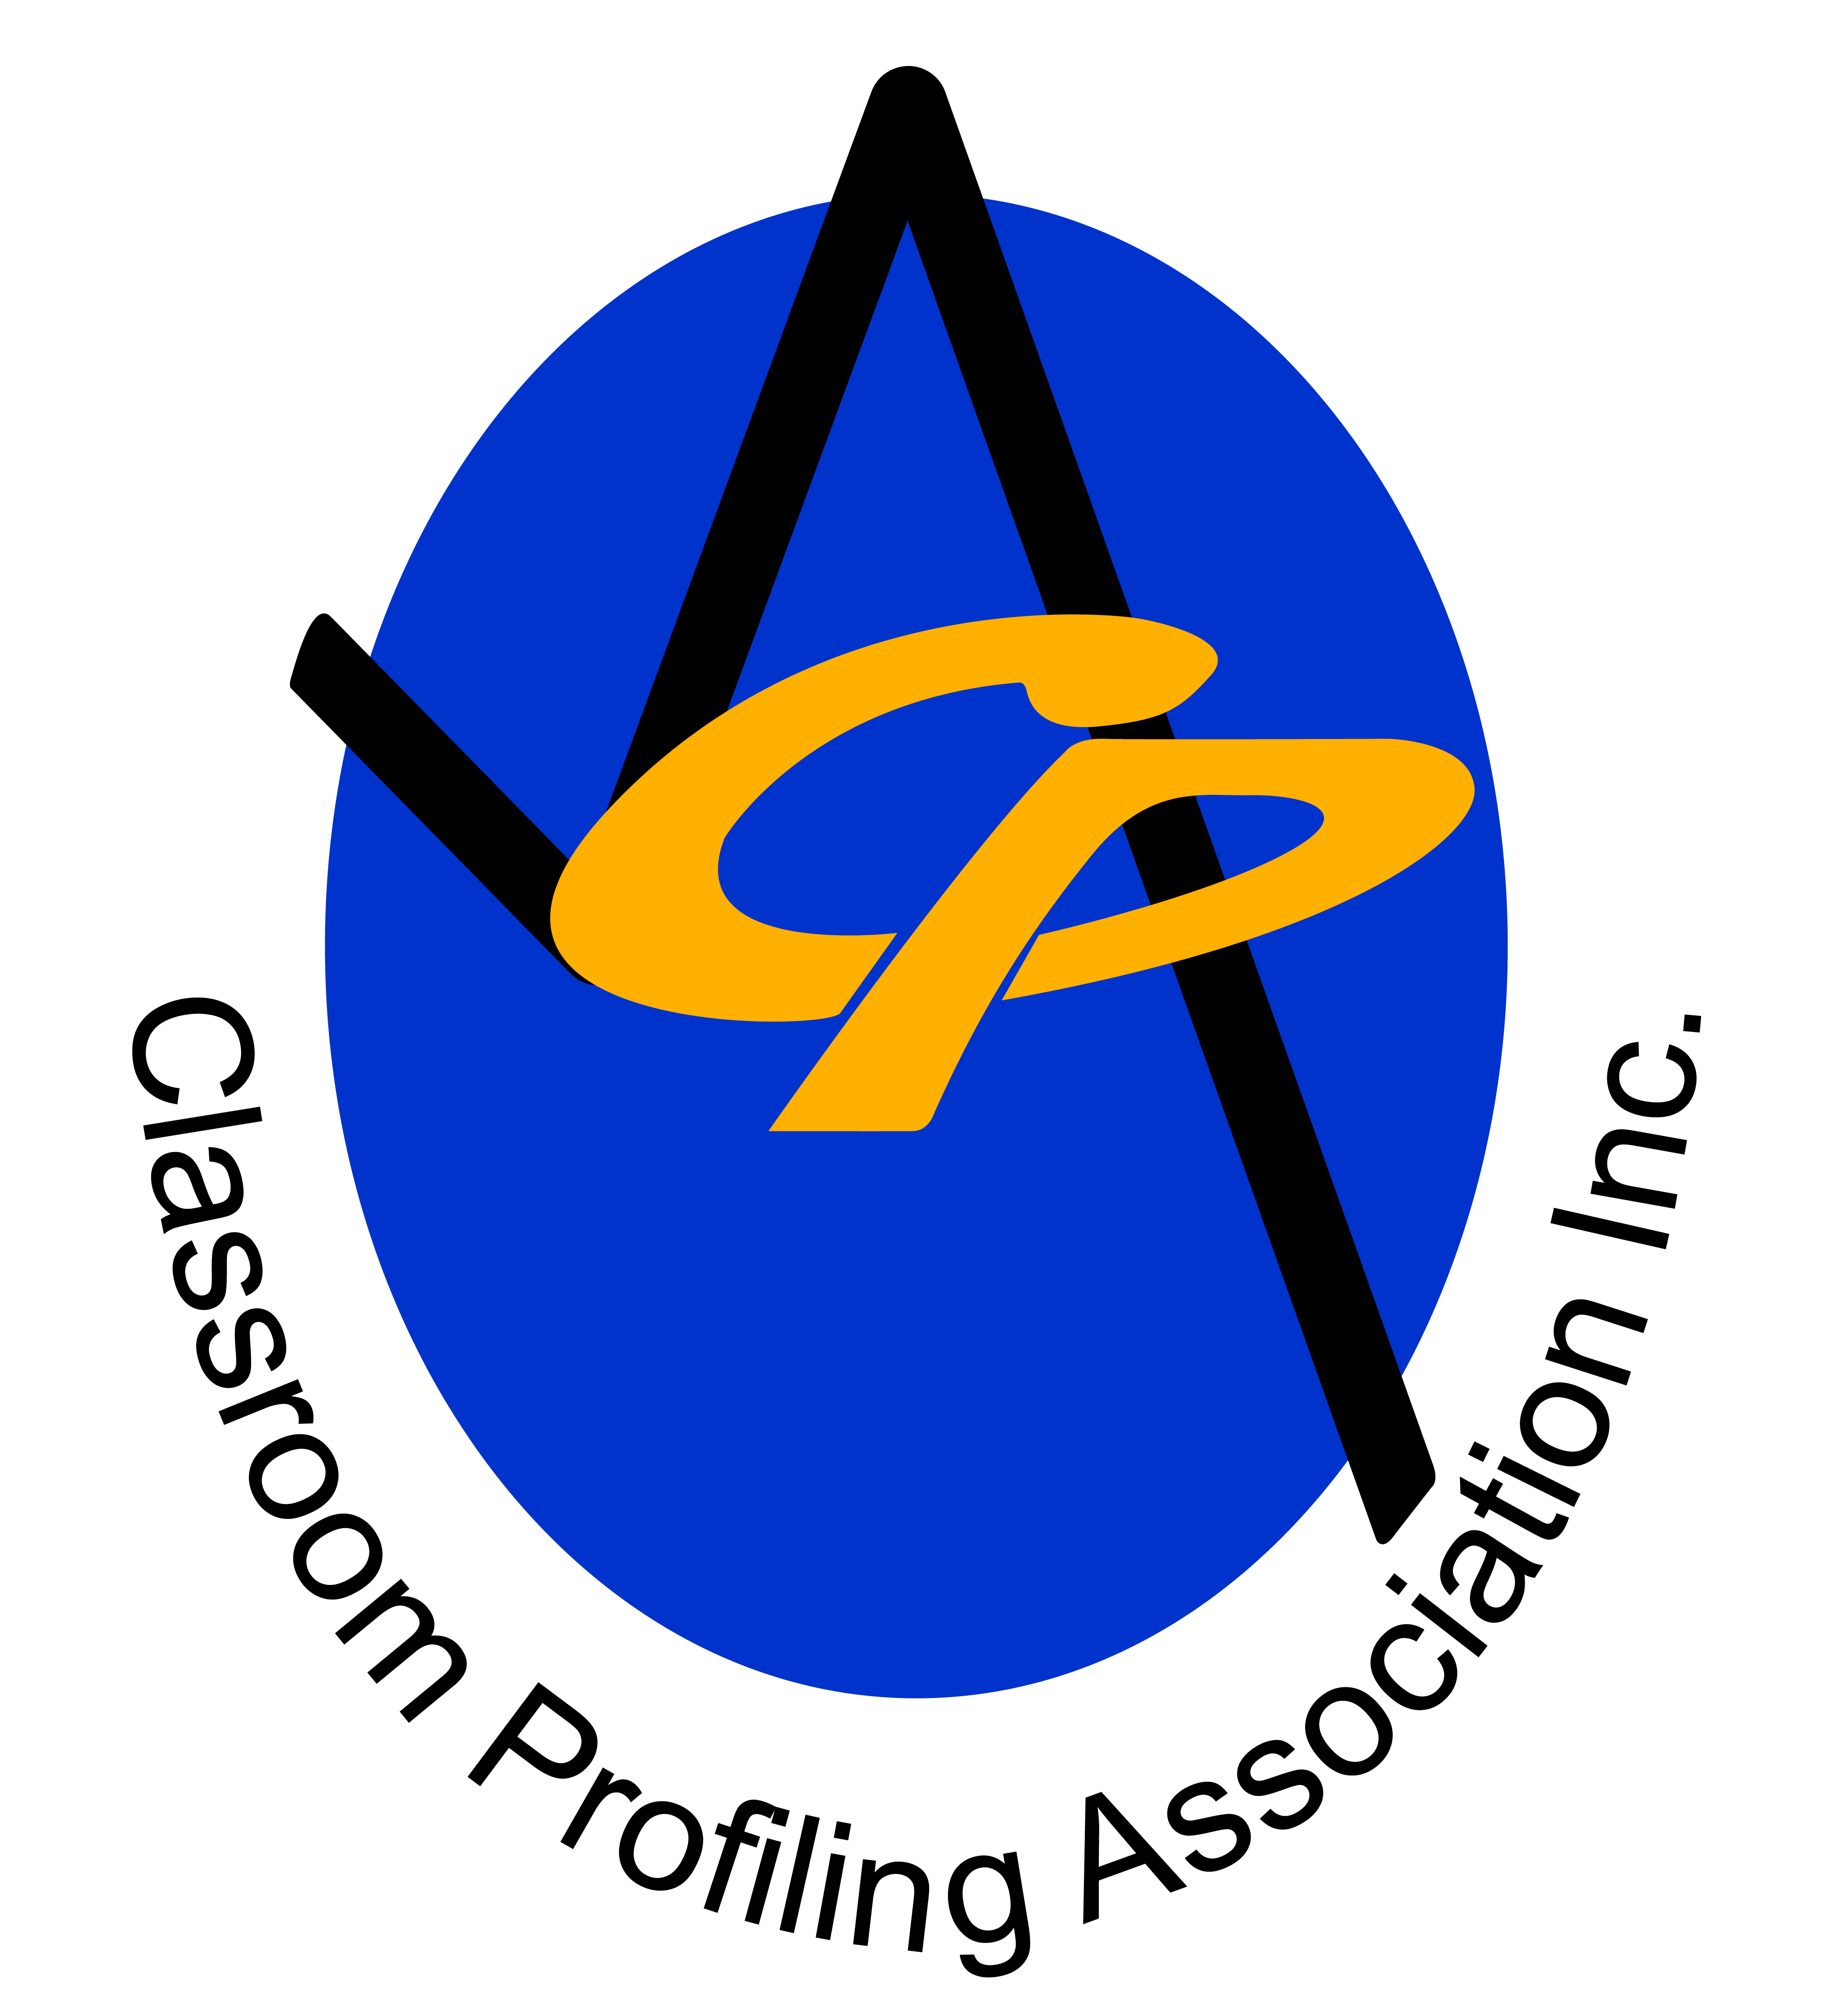 Classroom Profiling Association